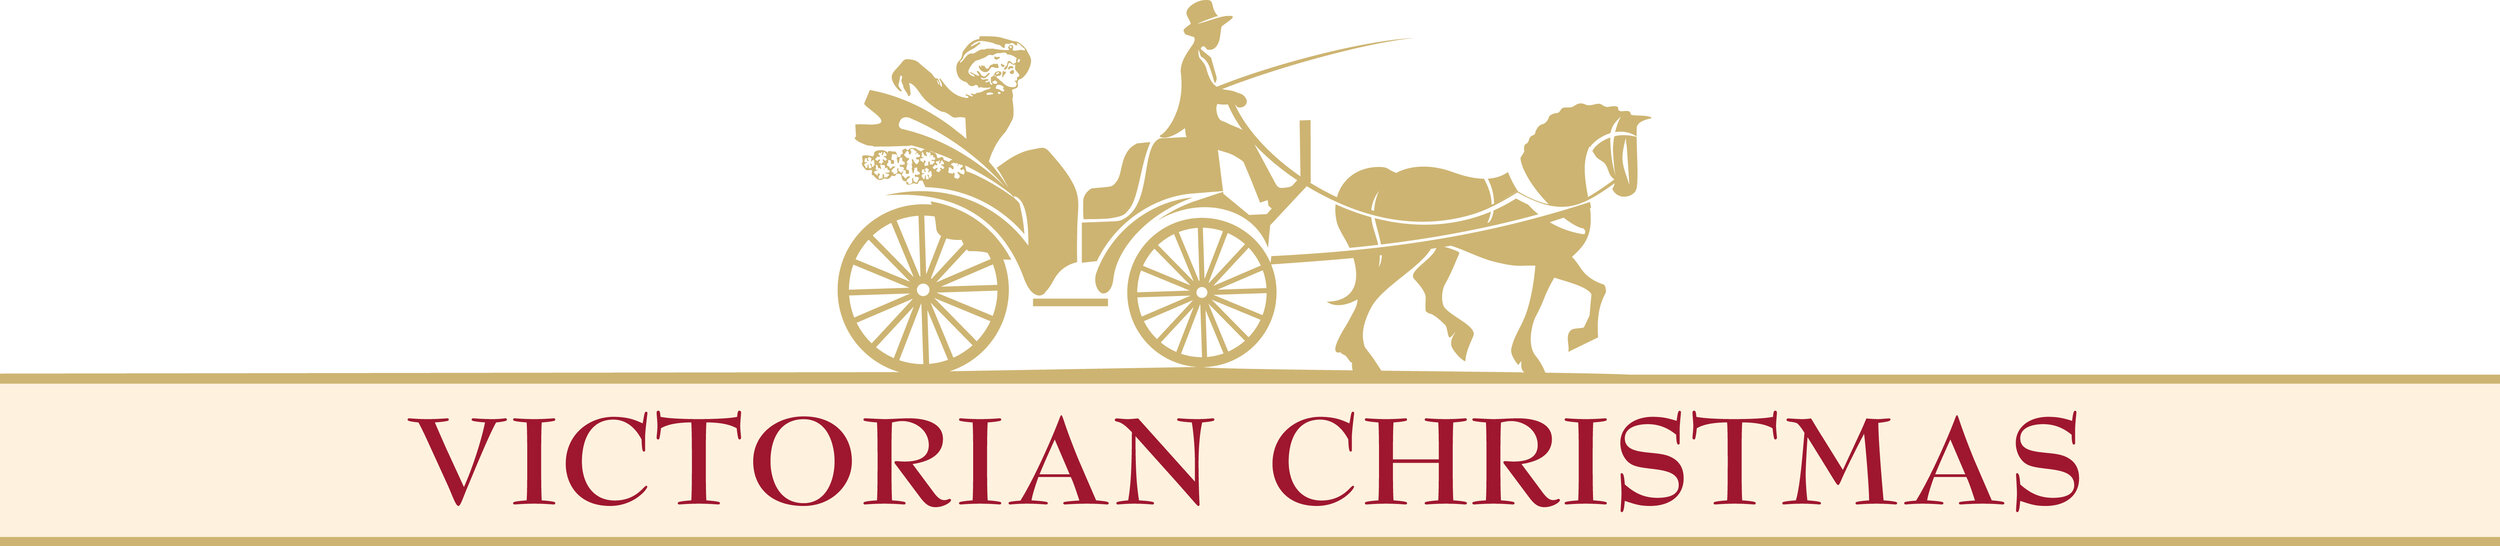 Victorian VERT Logo_2019.jpg